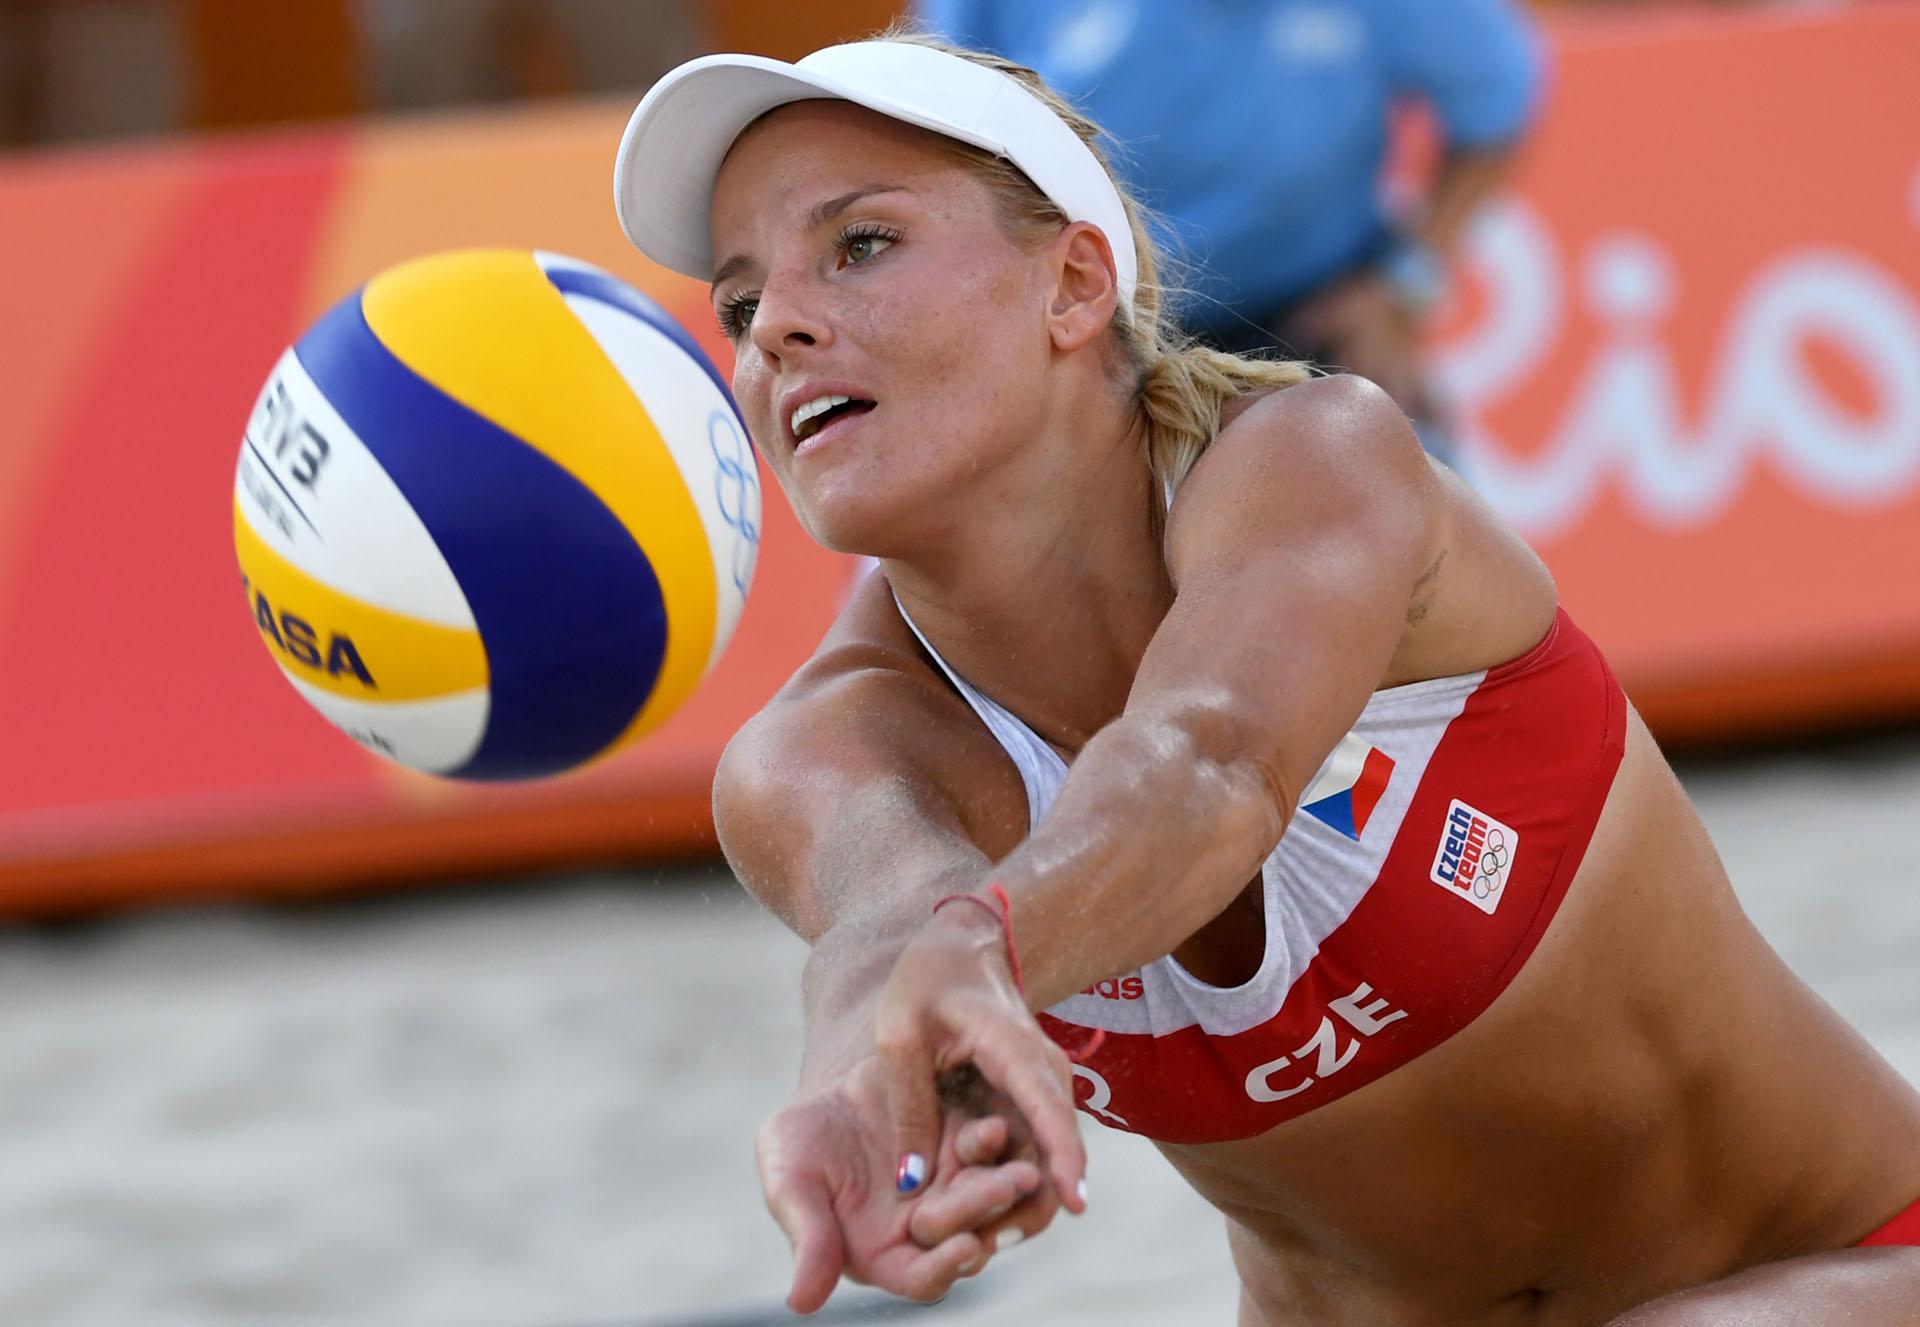 La selección checa de voleyball femenino de festival